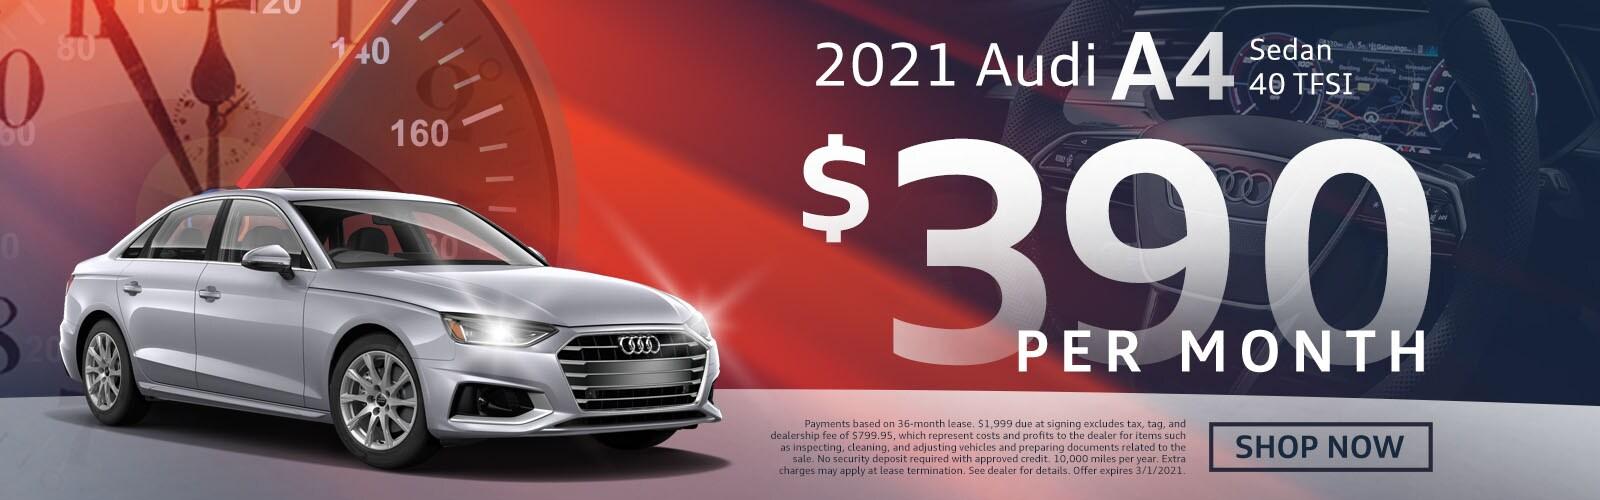 Audi Clearwater | New Audi Dealership near St. Petersburg ...